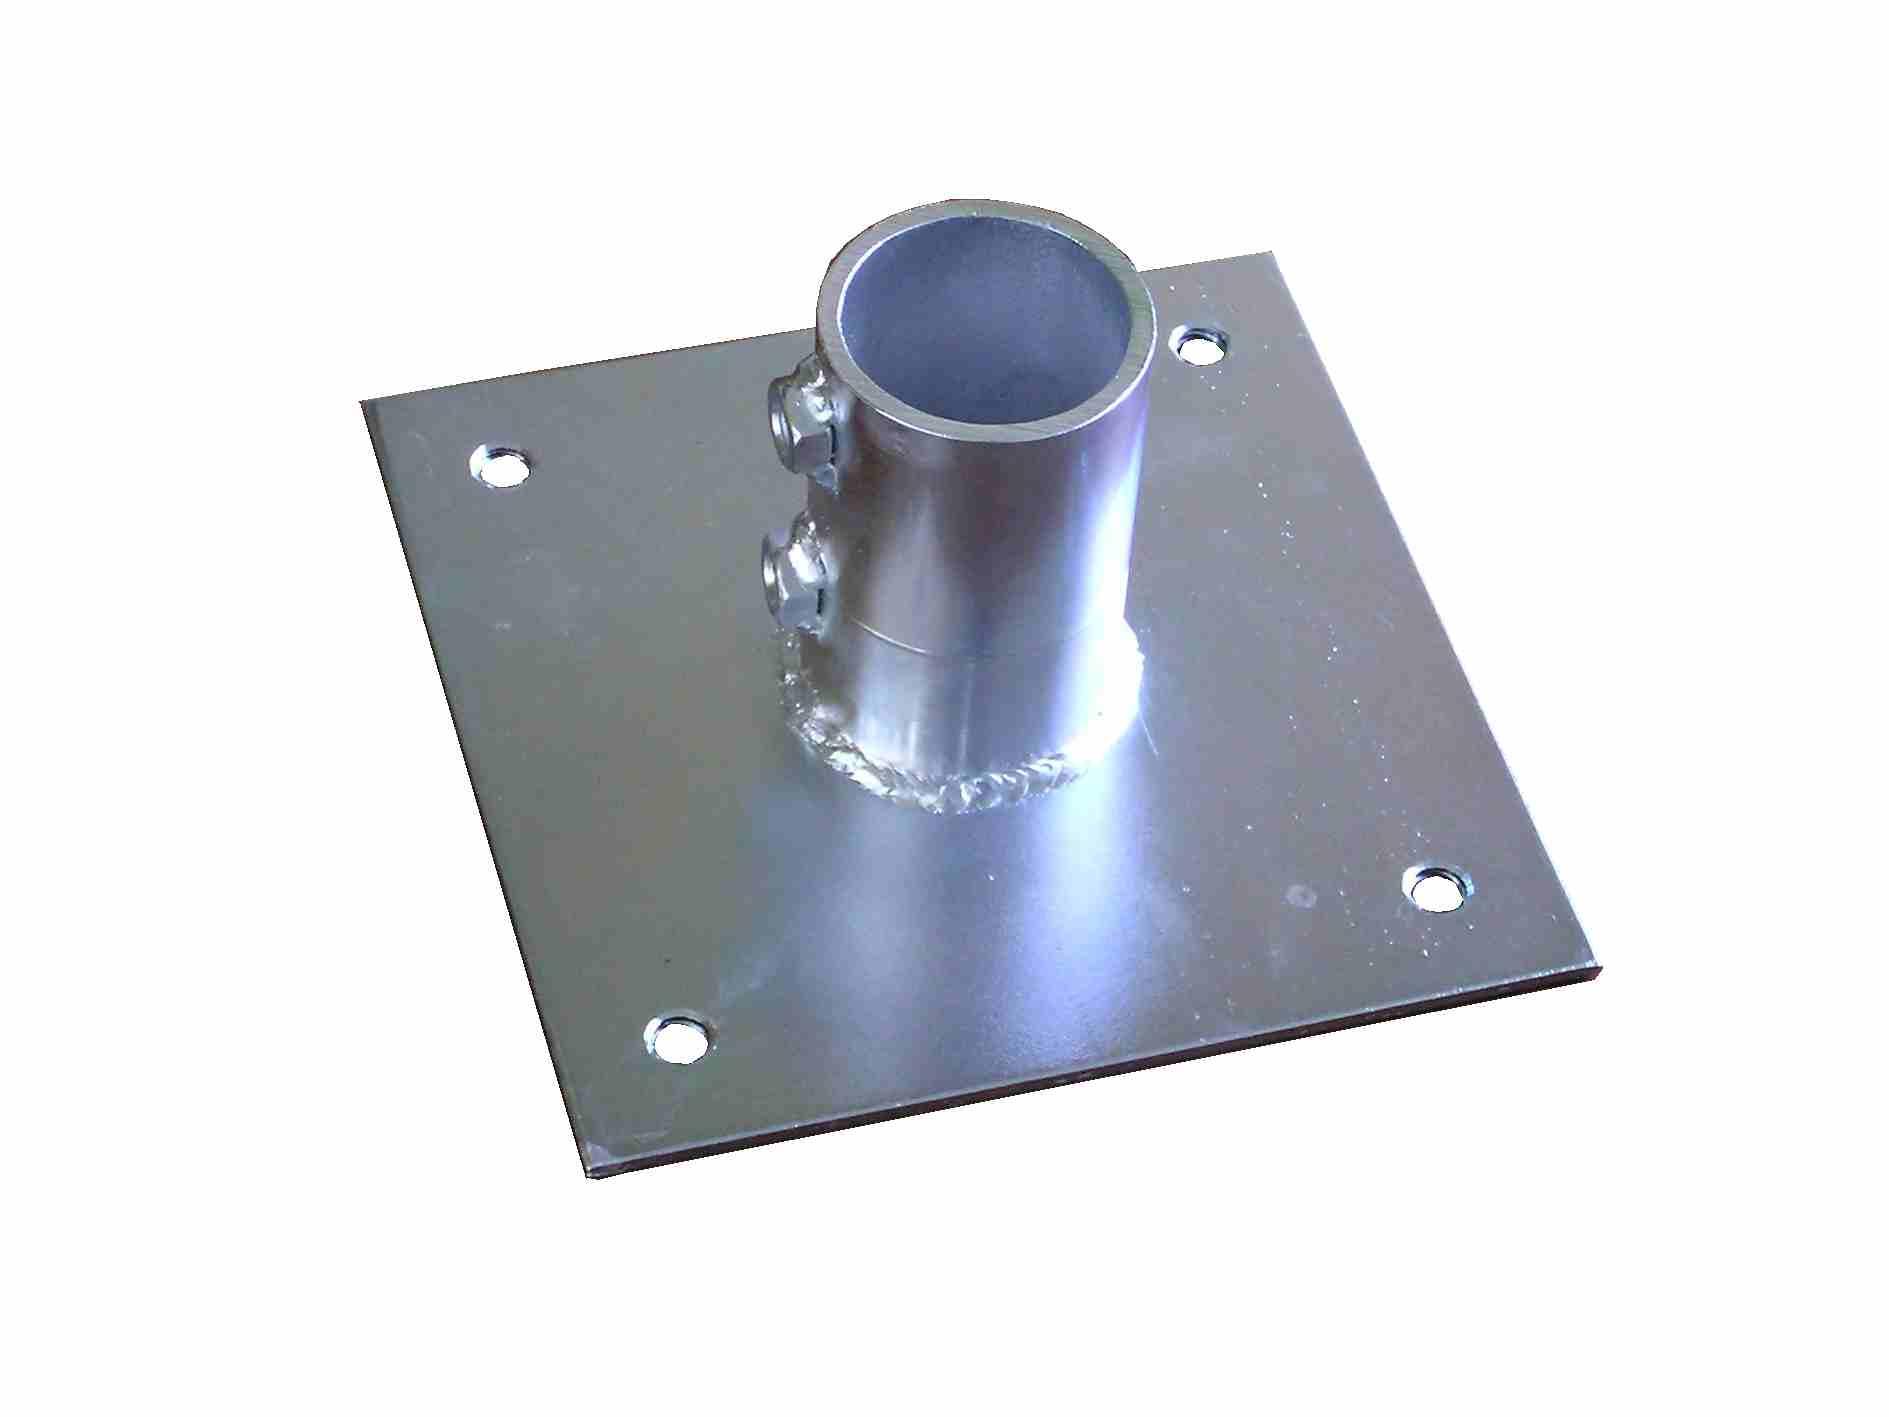 CSAT KP1 - kotviaci plech pre stožiar (200x200mm)